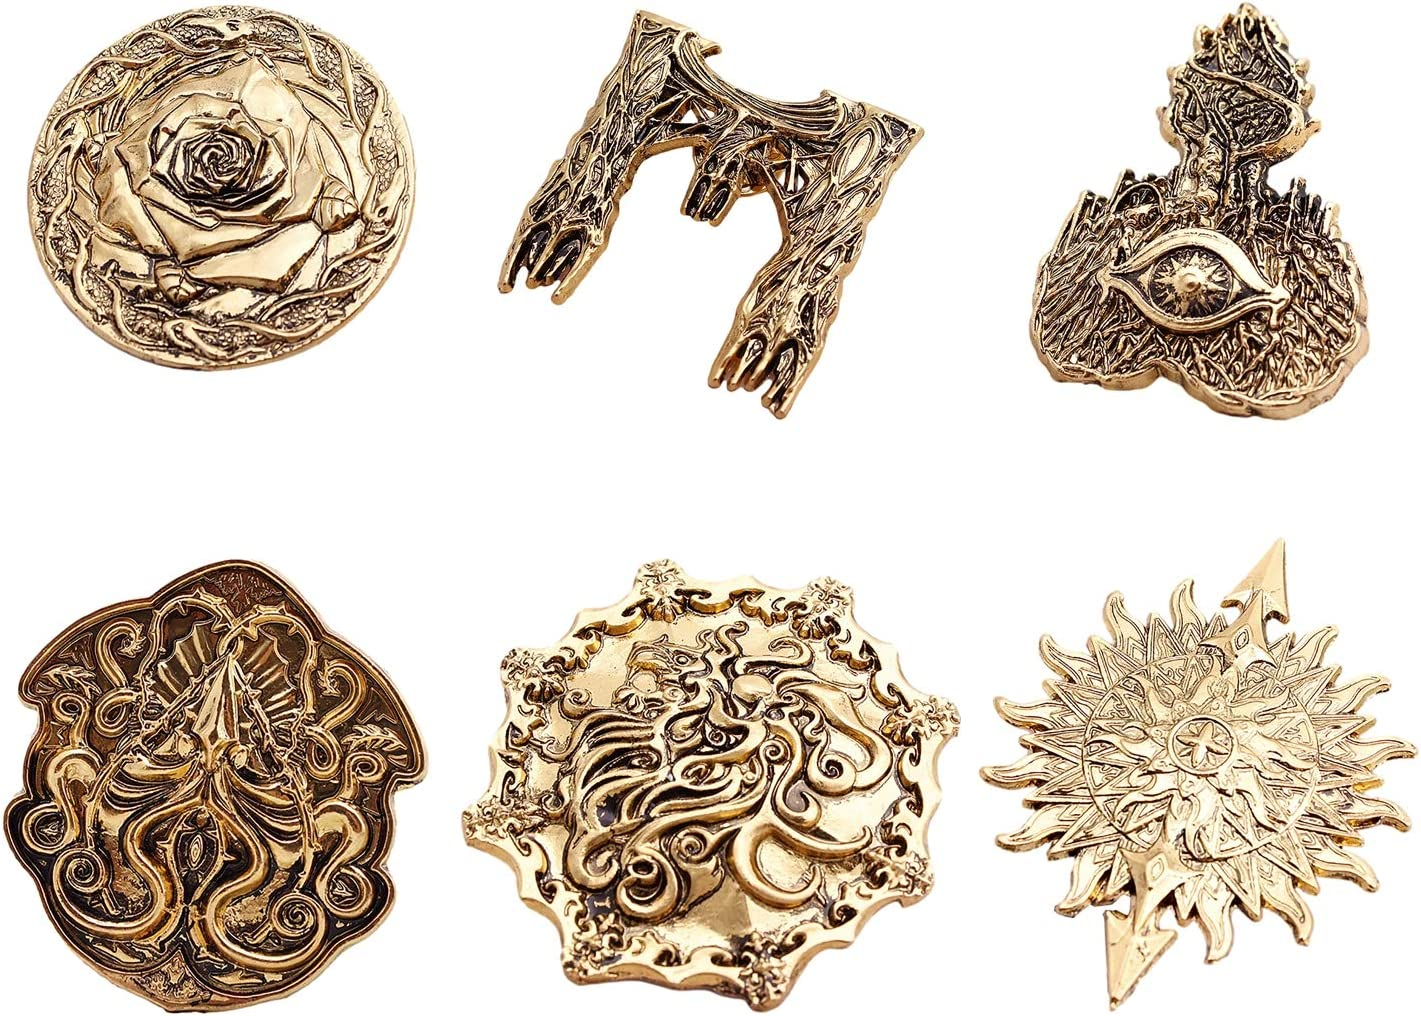 WYZDQ Men Lapel Pin/Shirt Stud Golden Badge Coat Suit Wedding Gift Party Shirt Collar Accessories Brooch (6 Packs)